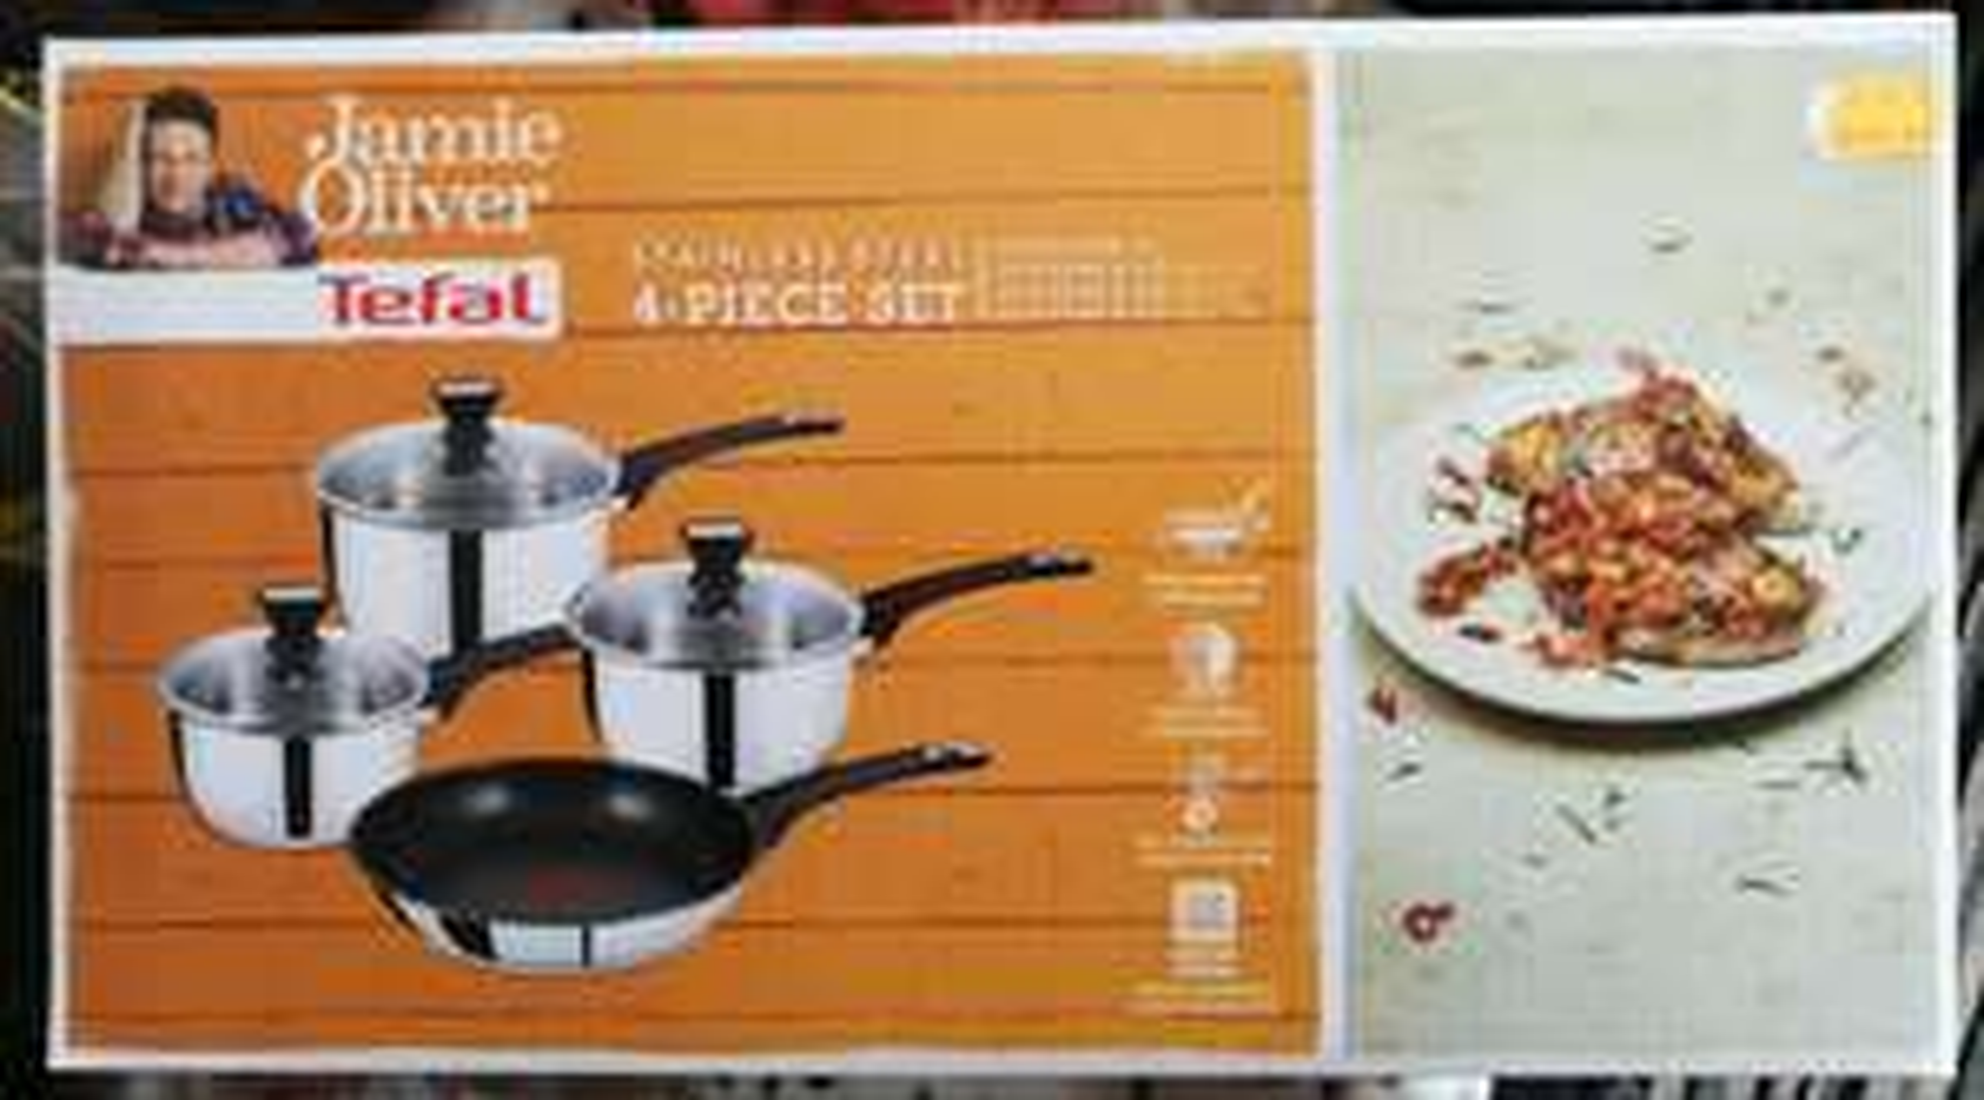 Tefal Jamie Oliver 4 piece stainless pan set £39.99 @ Watt Brothers